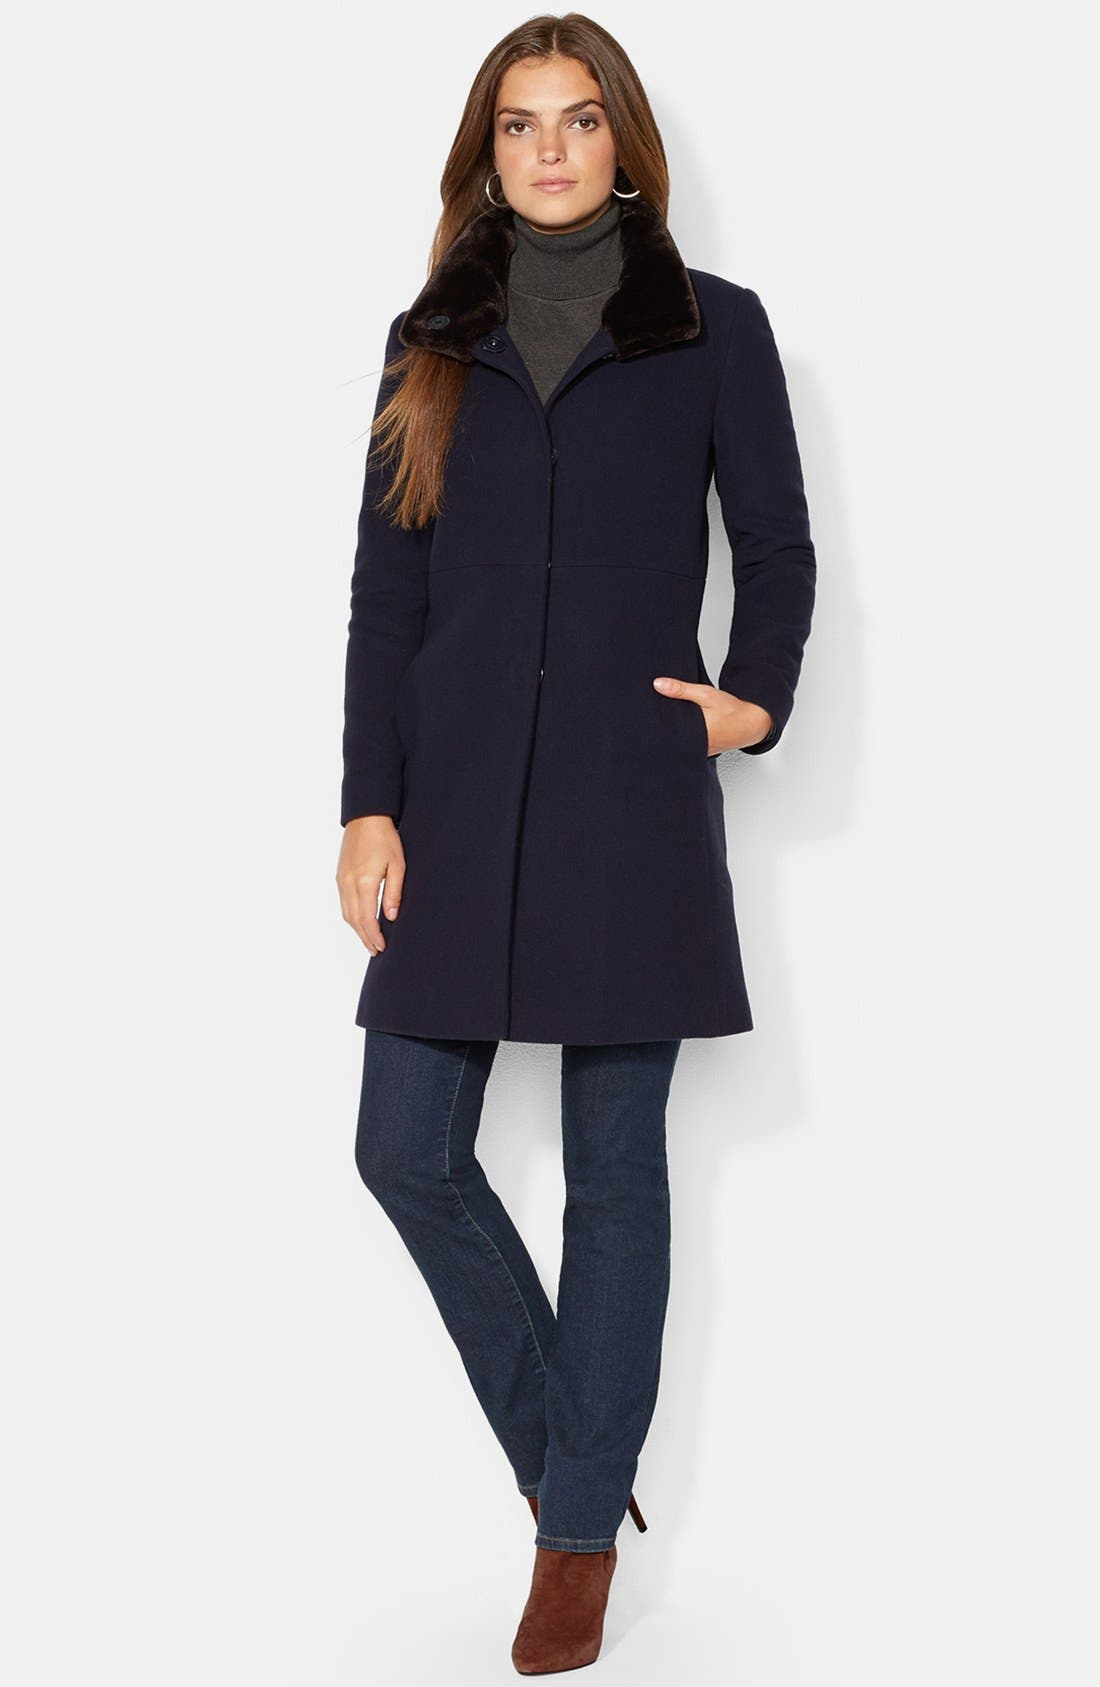 Alternate Image 1 Selected - Lauren Ralph Lauren Faux Fur Trim Wool Blend Coat